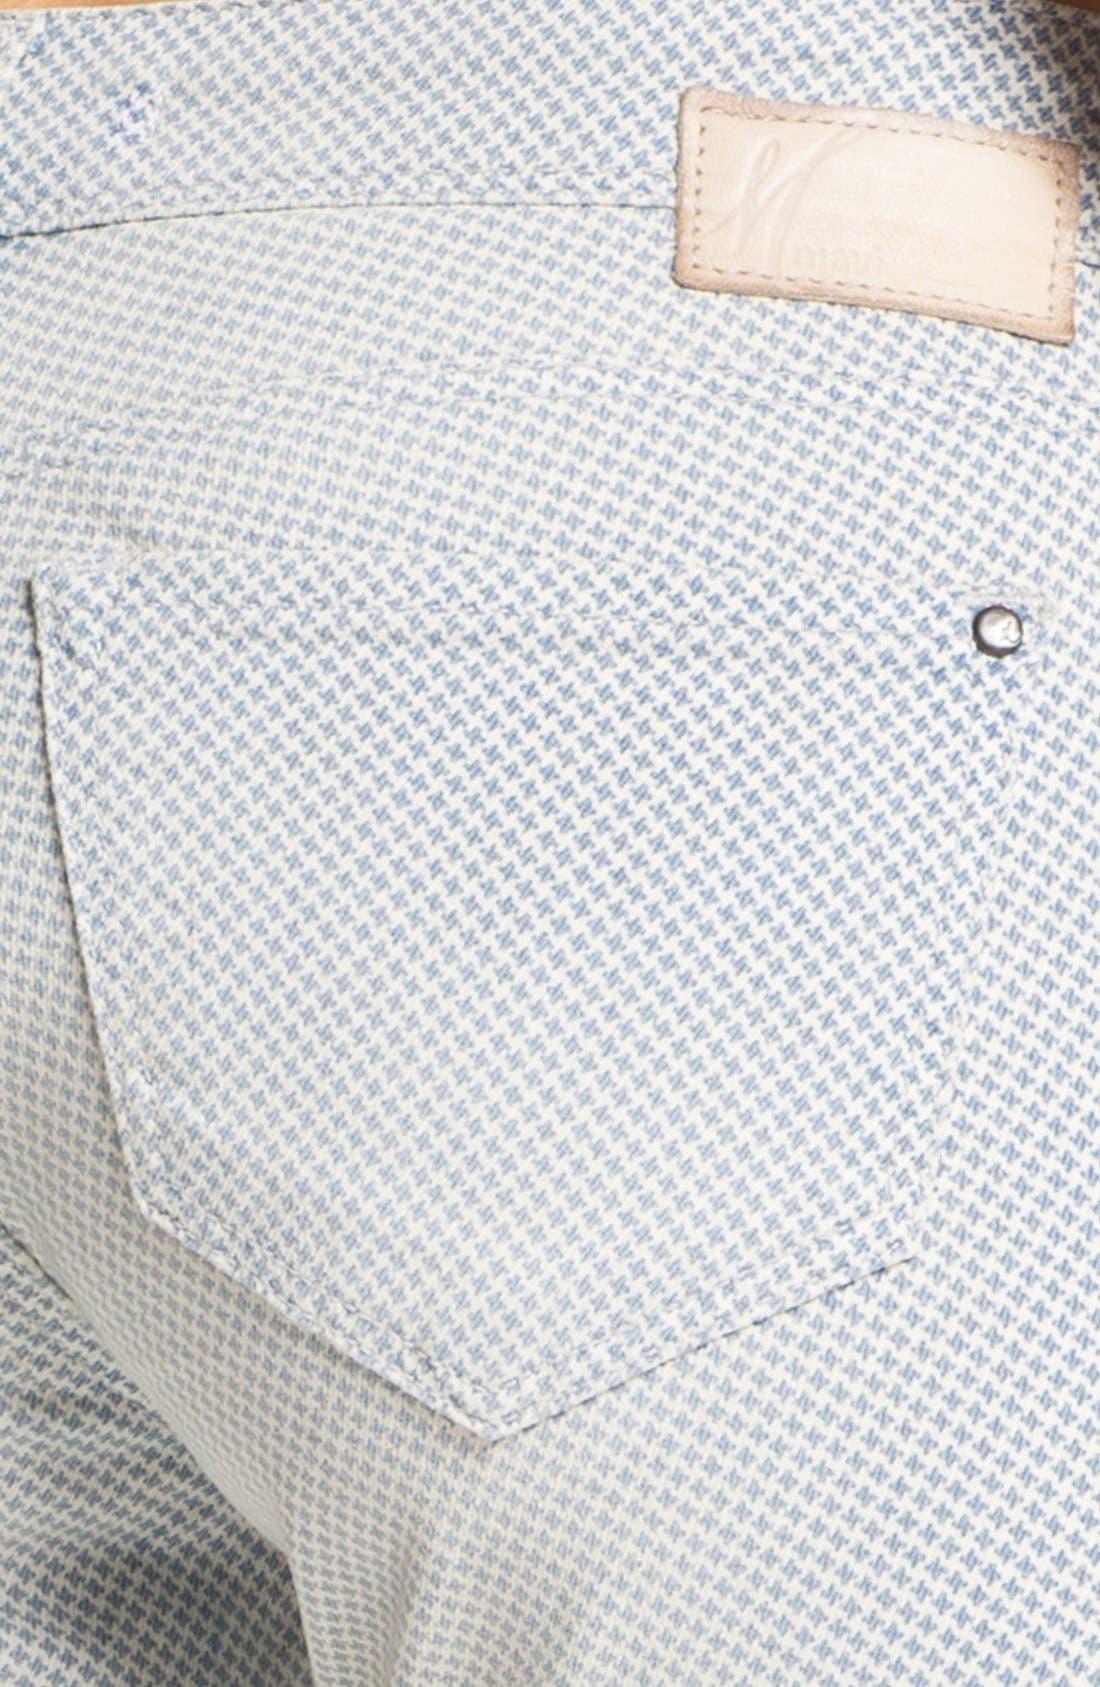 Alternate Image 3  - Mavi Jeans 'Alexa' Super Skinny Print Jeans